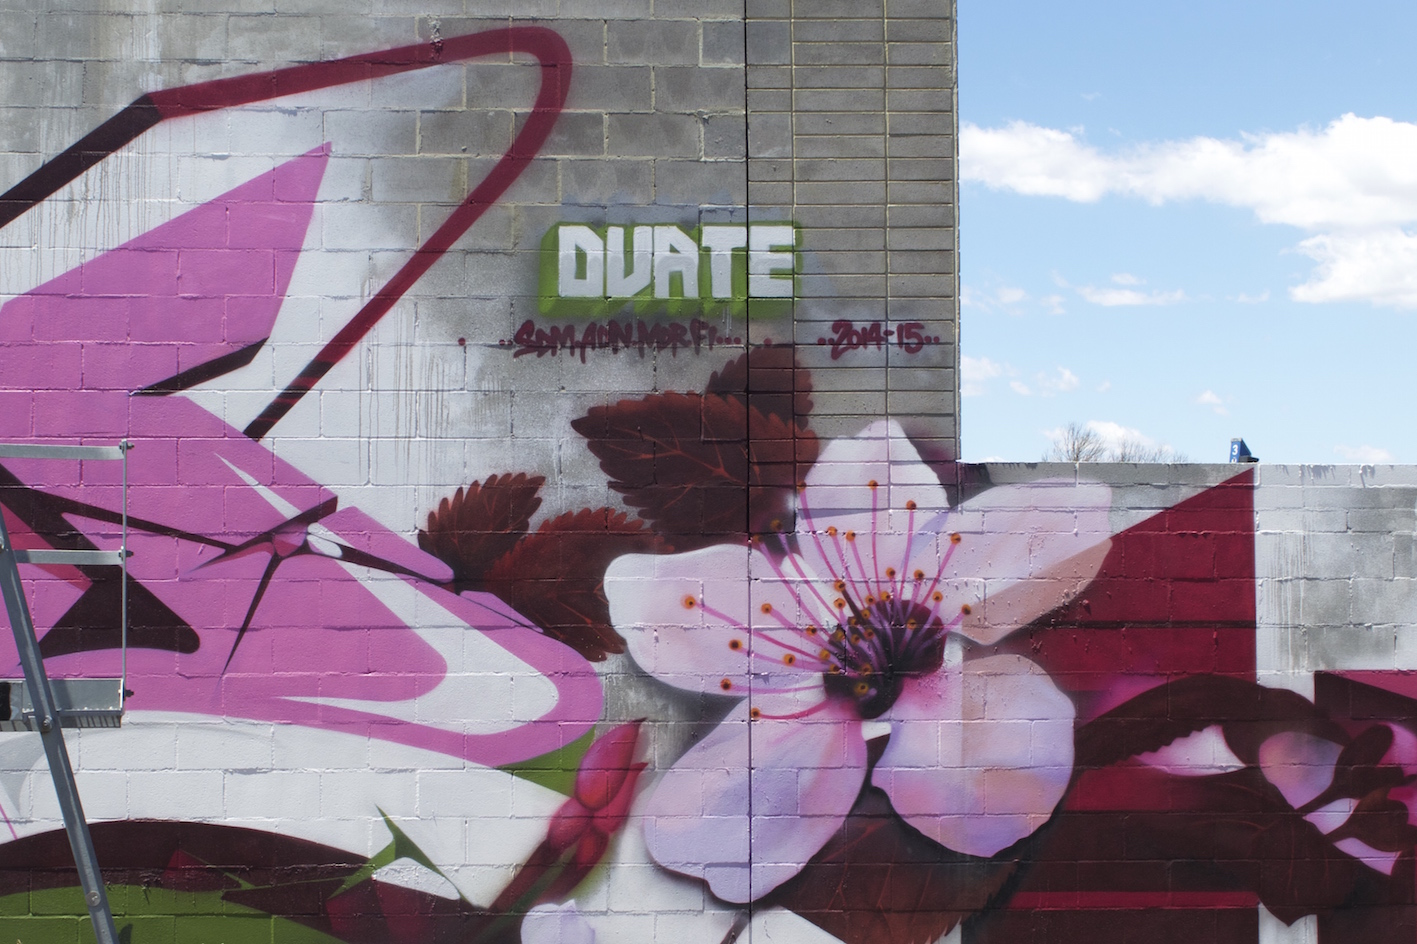 deansunshine_landofsunshine_melbourne_streetart_graffiti_ DVATE going large melb 5